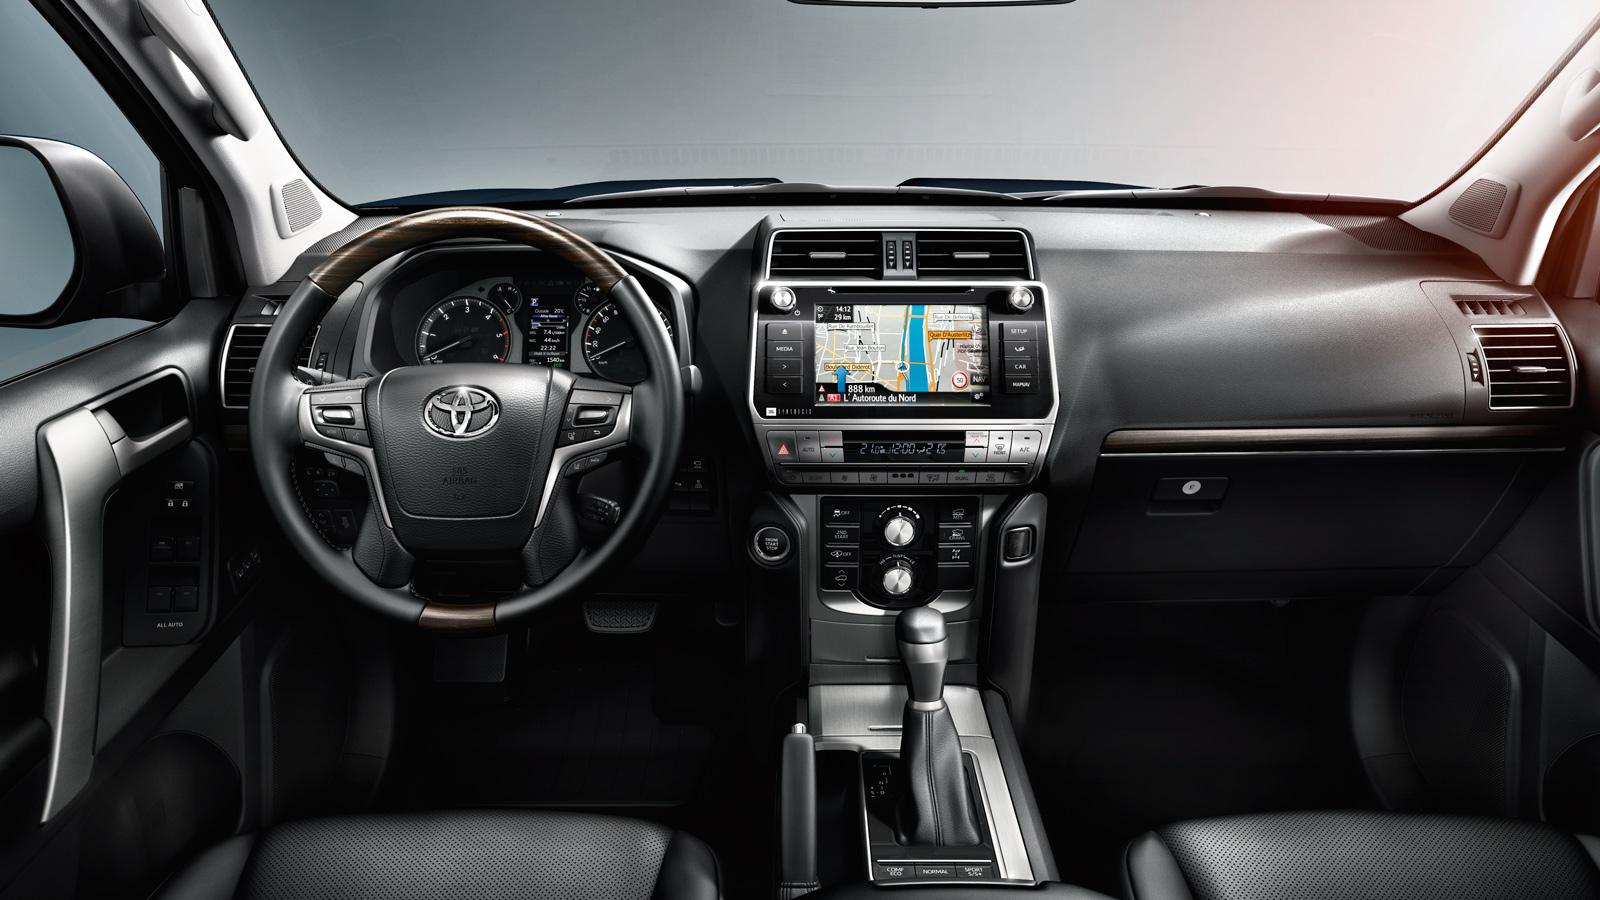 Land Cruiser Kraftvolle Legende Toyota De 232 34 Monat